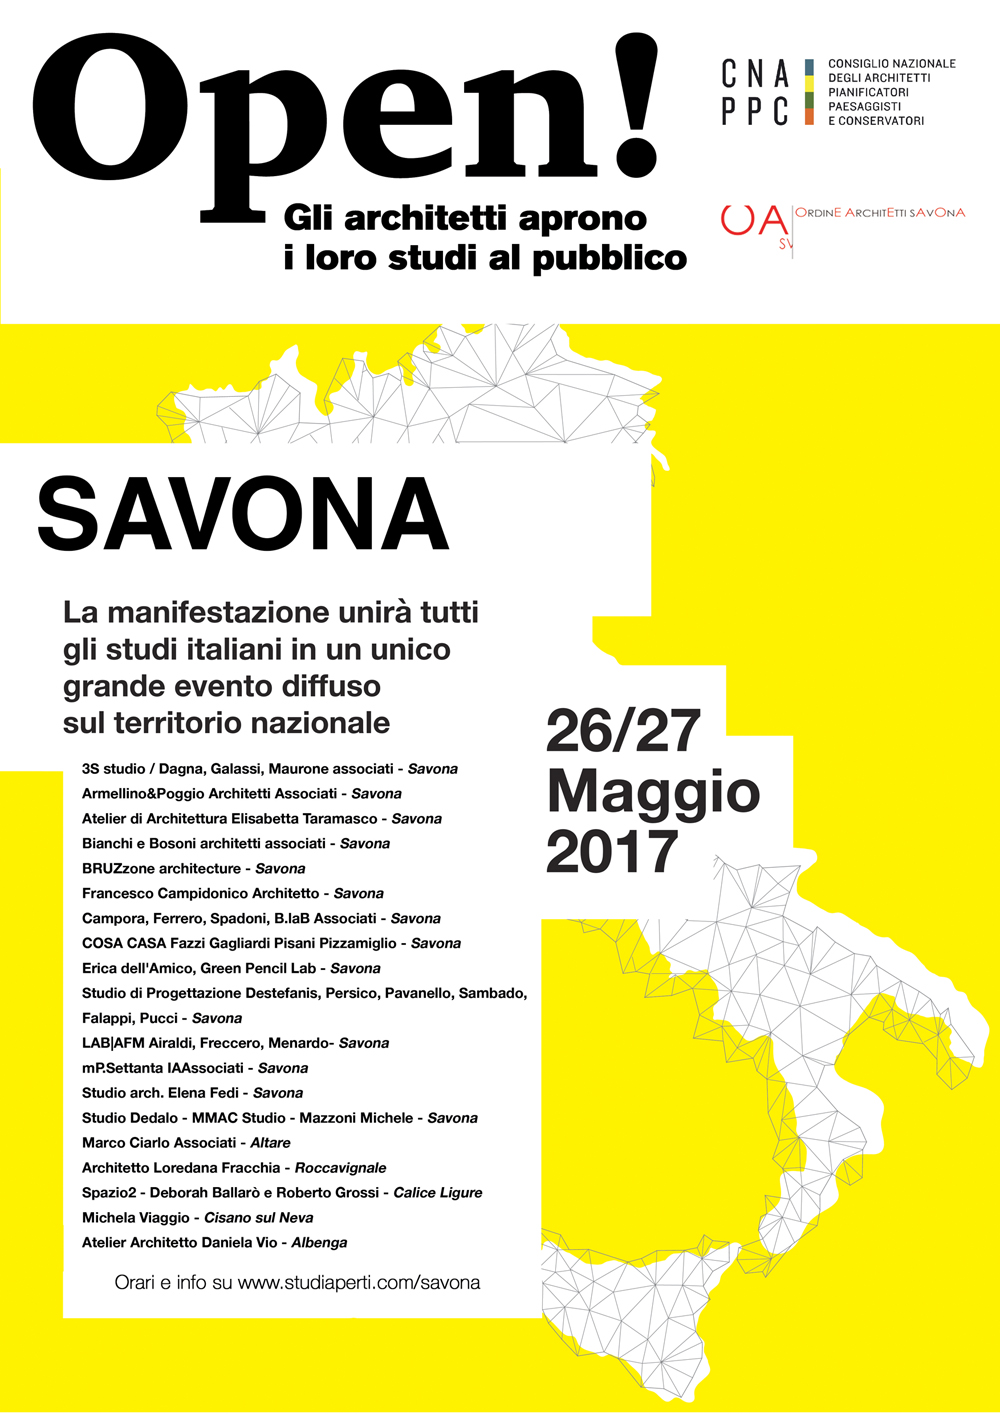 Architetti Savona Elenco open! studiaperti   architetti savona